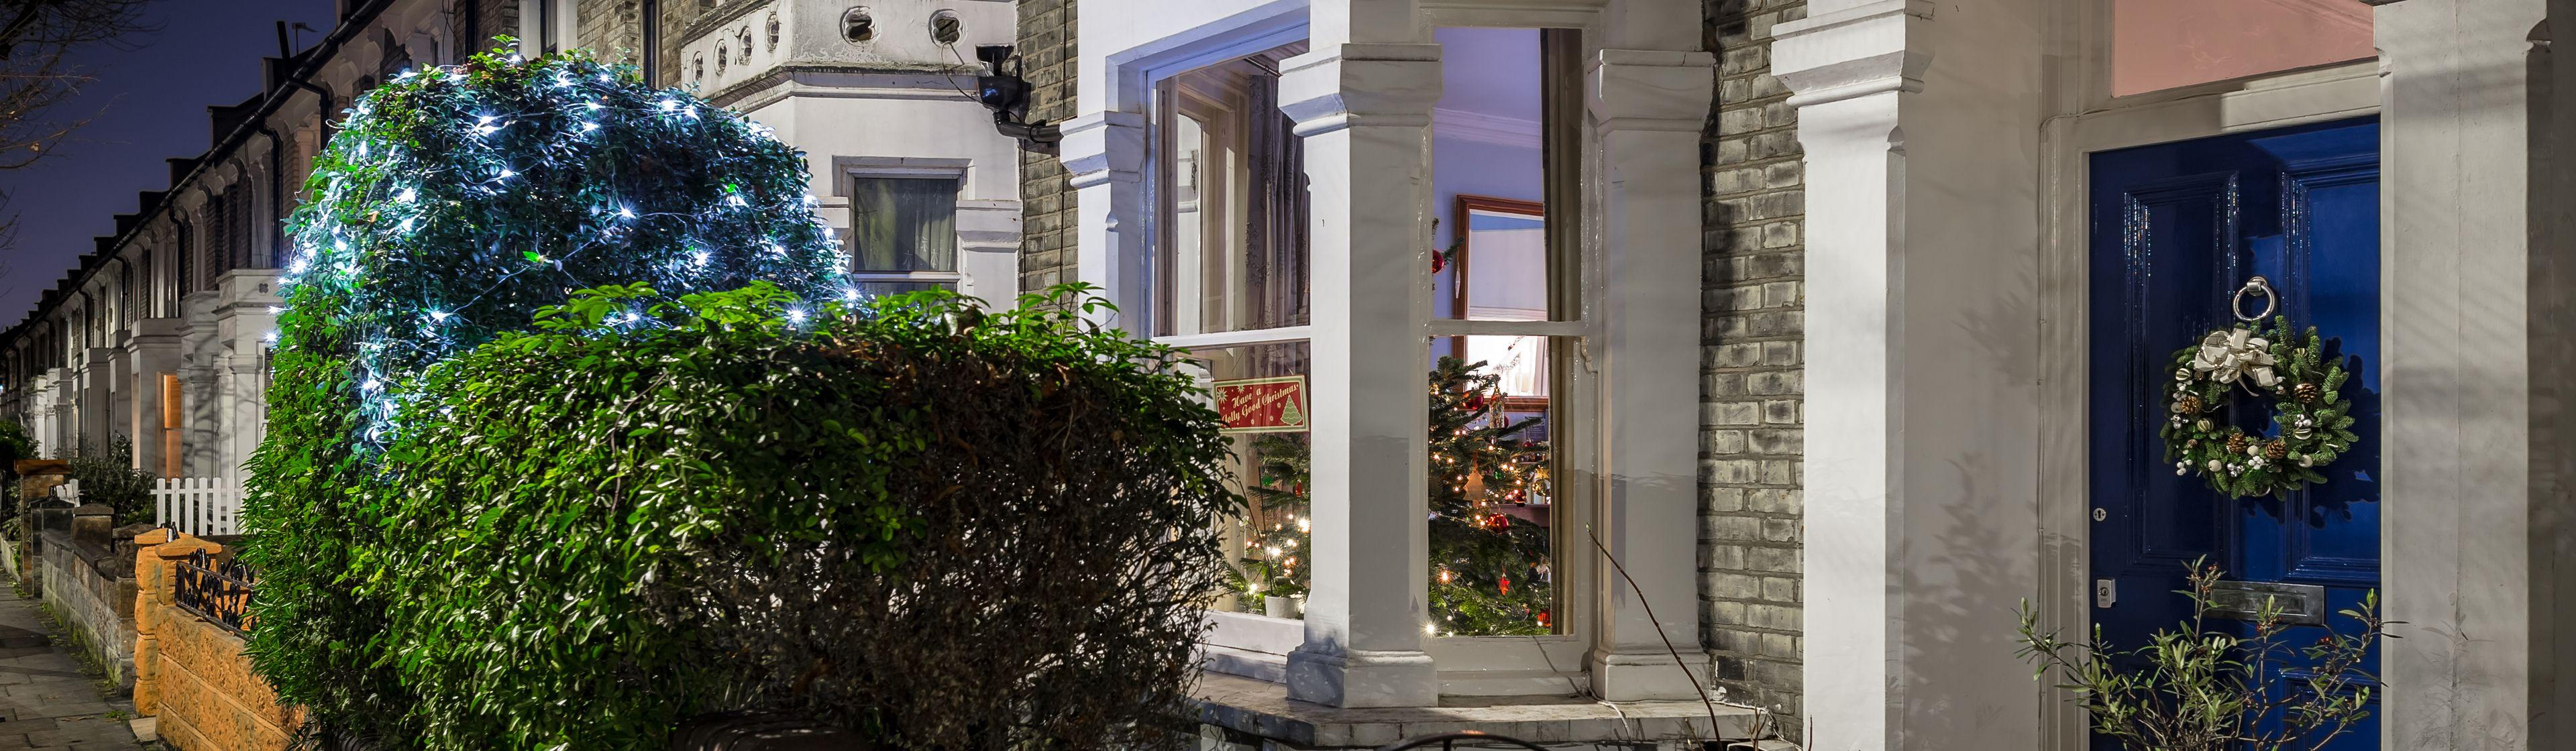 London house at Christmas